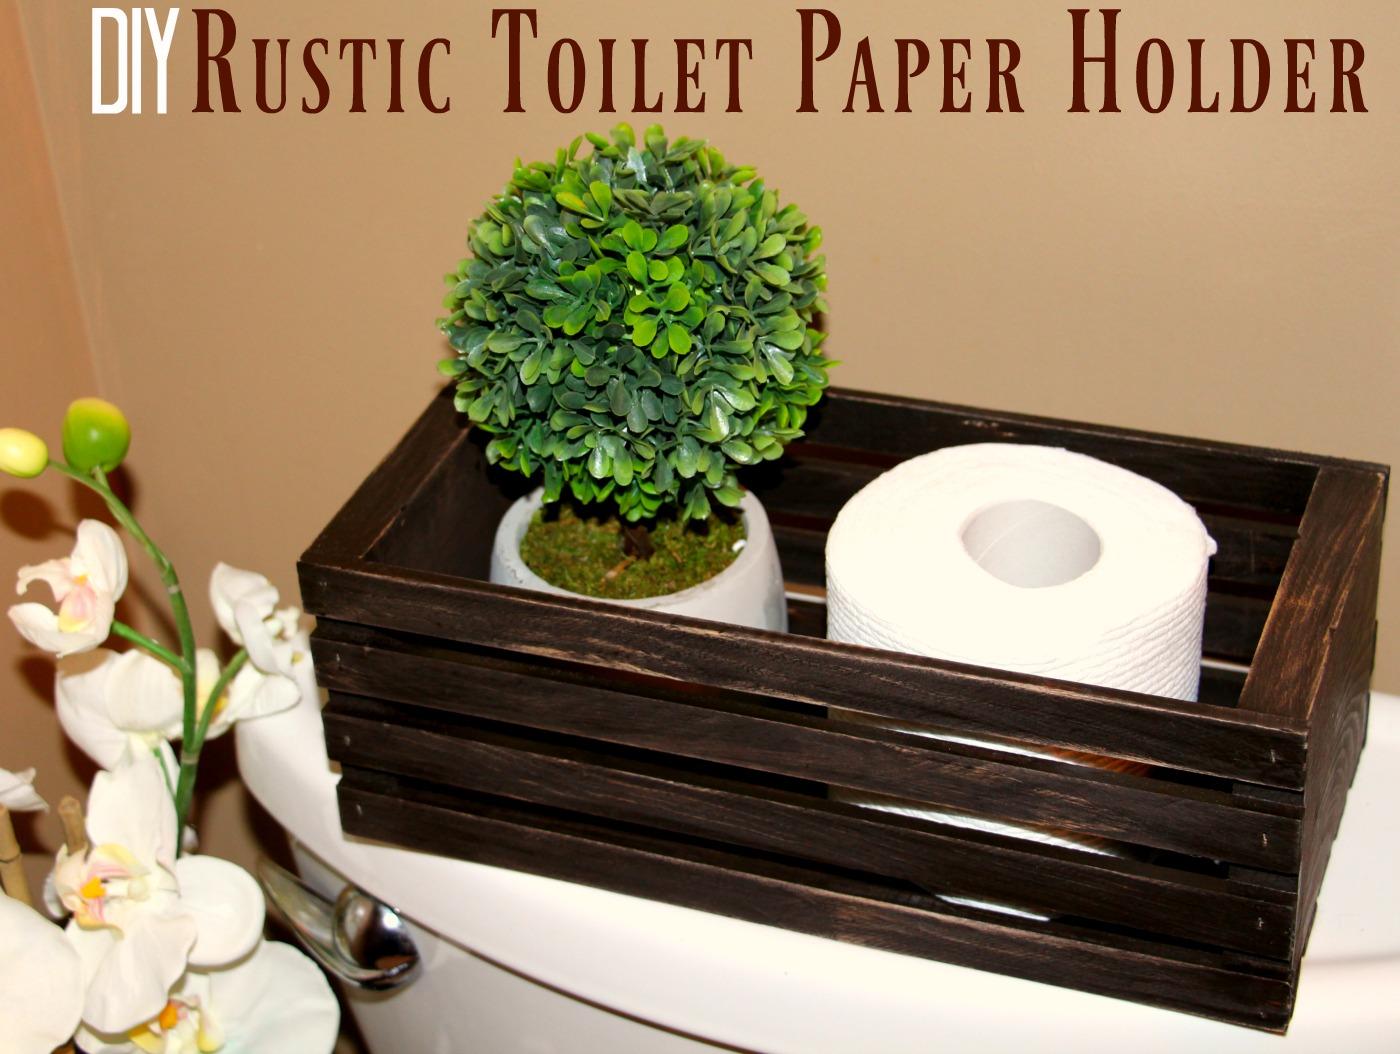 DIY Rustic Toilet Paper Holder